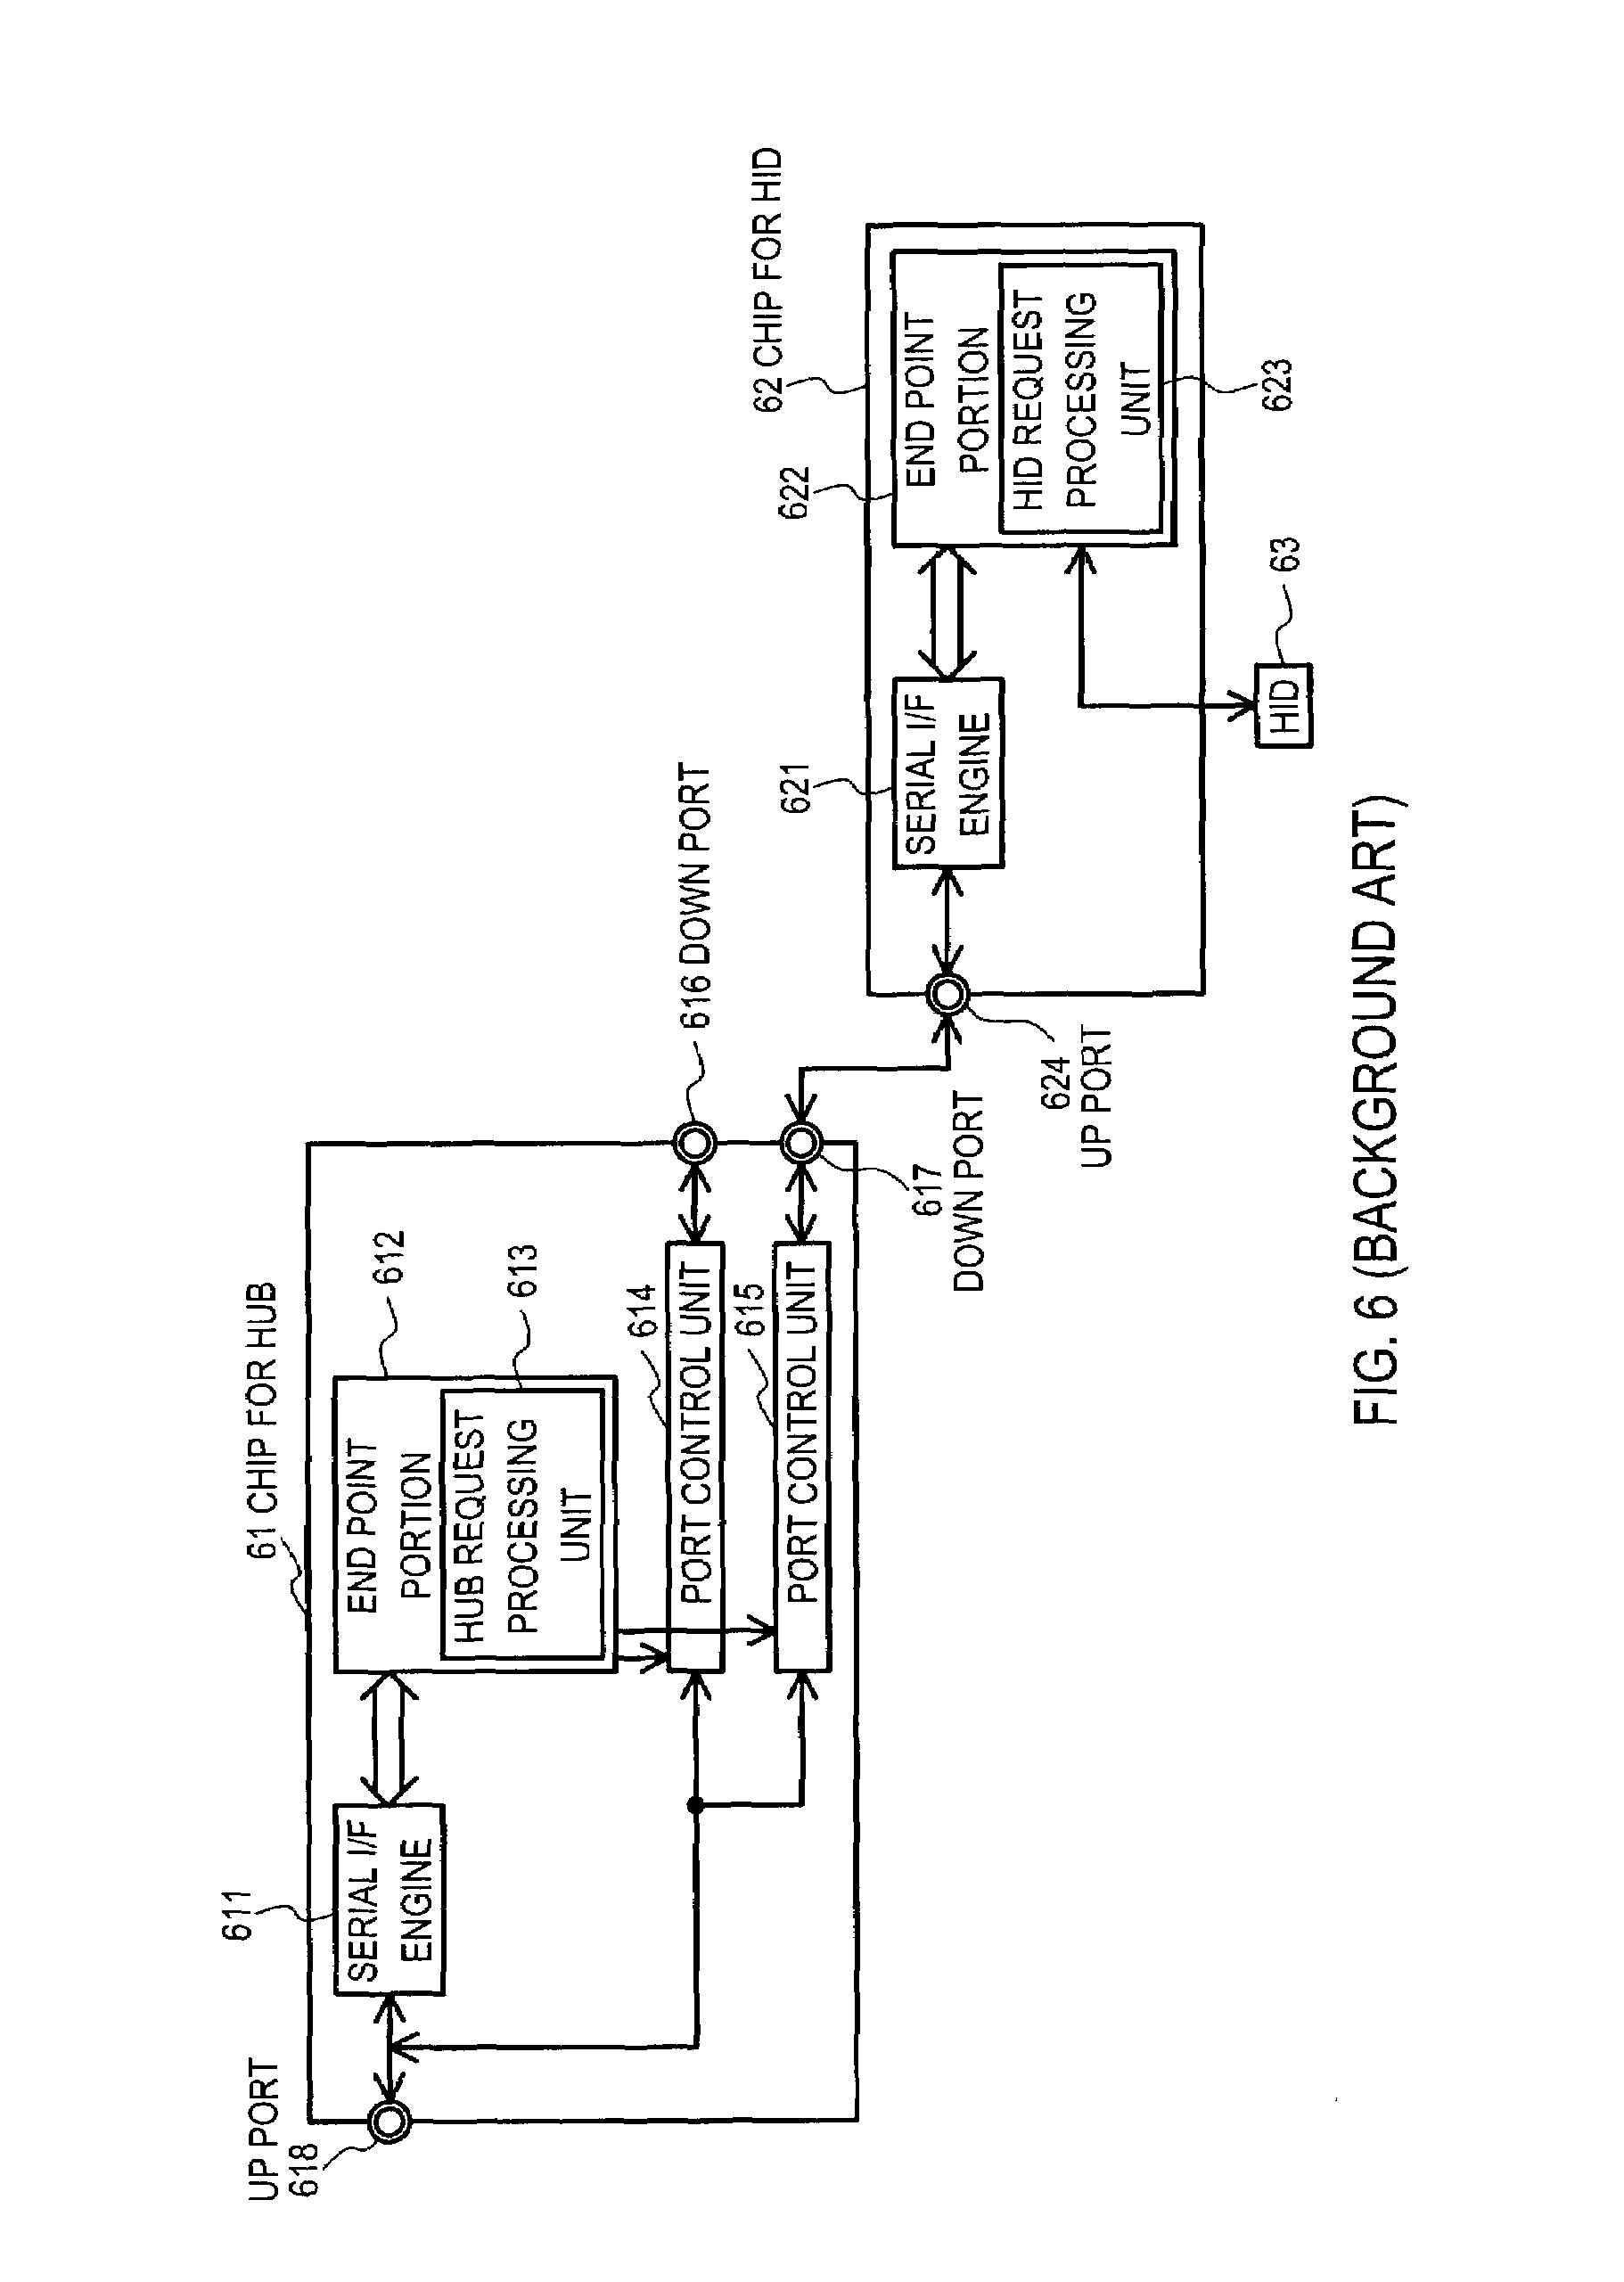 usb-hub device and its control method